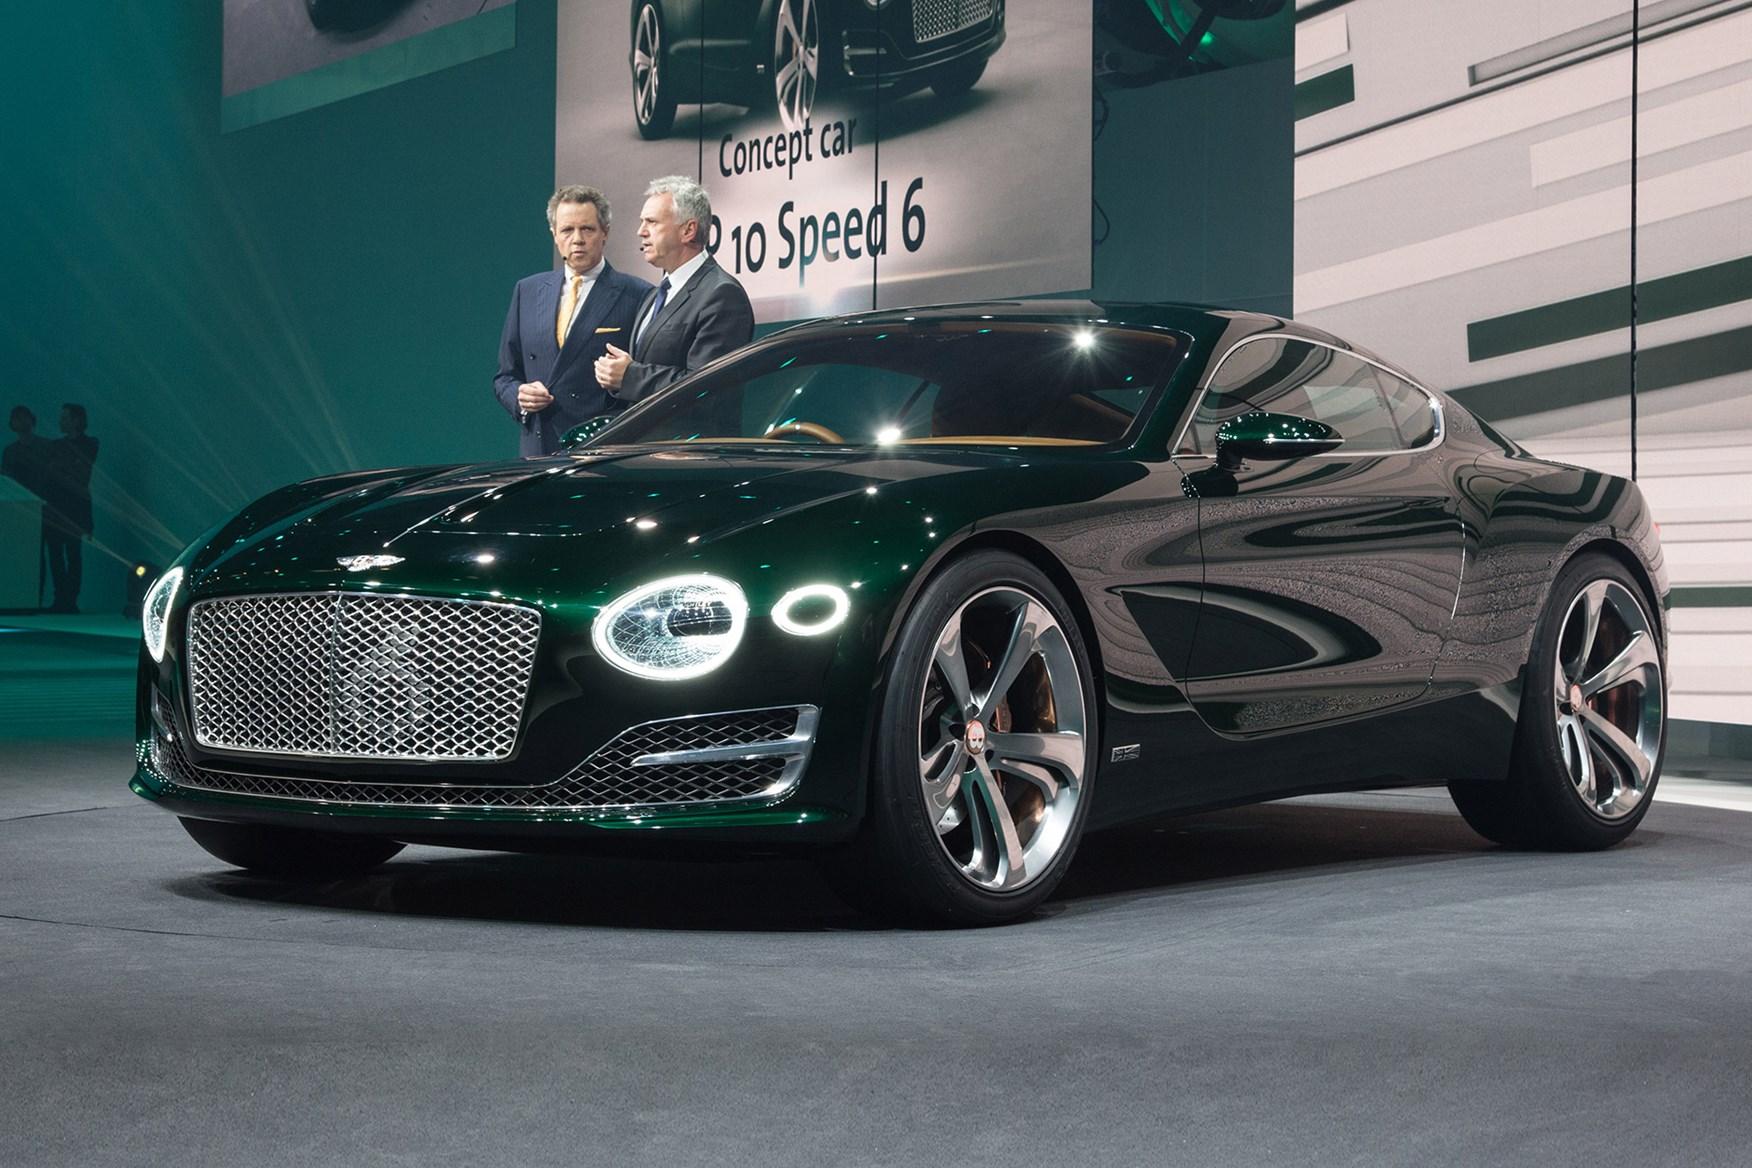 Bentley Top Brass Reveal The EXP 10 Speed 6 At Geneva